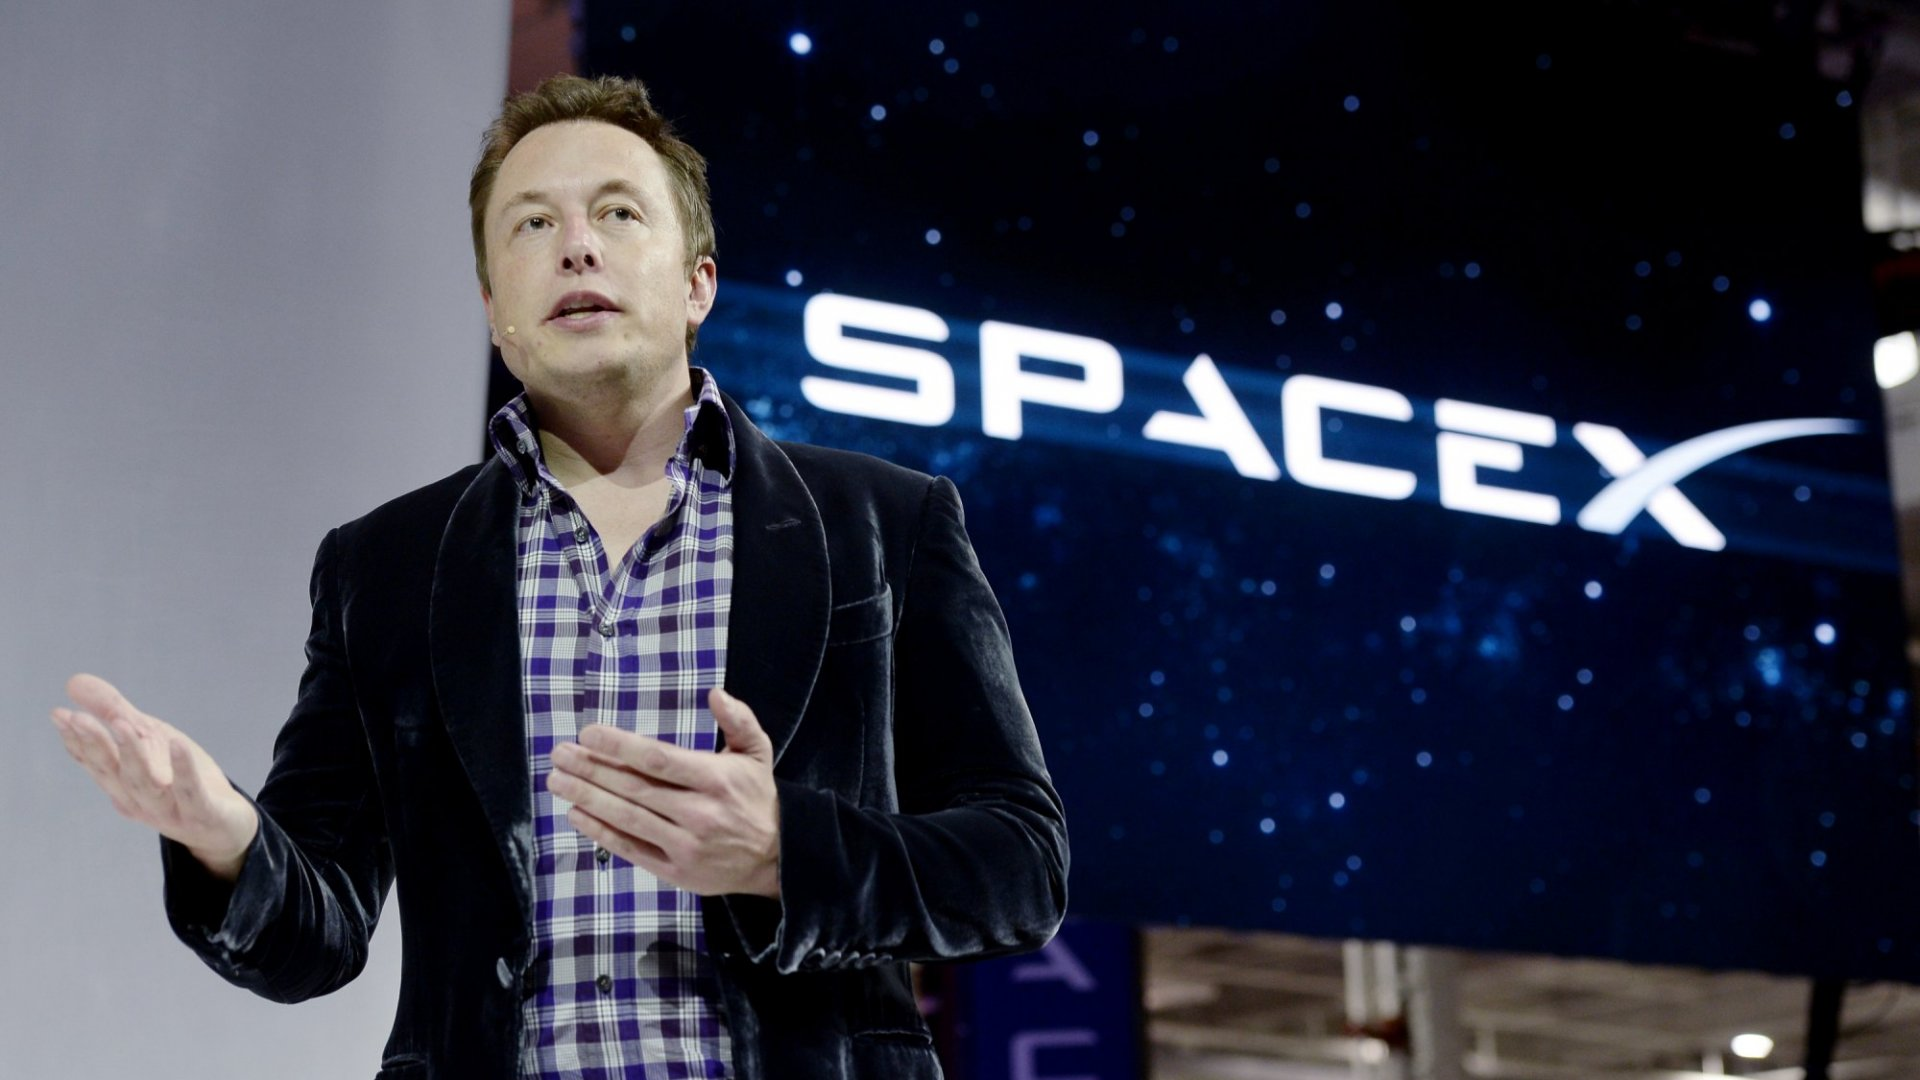 MIT Wins Design Competition for Elon Musk's Hyperloop